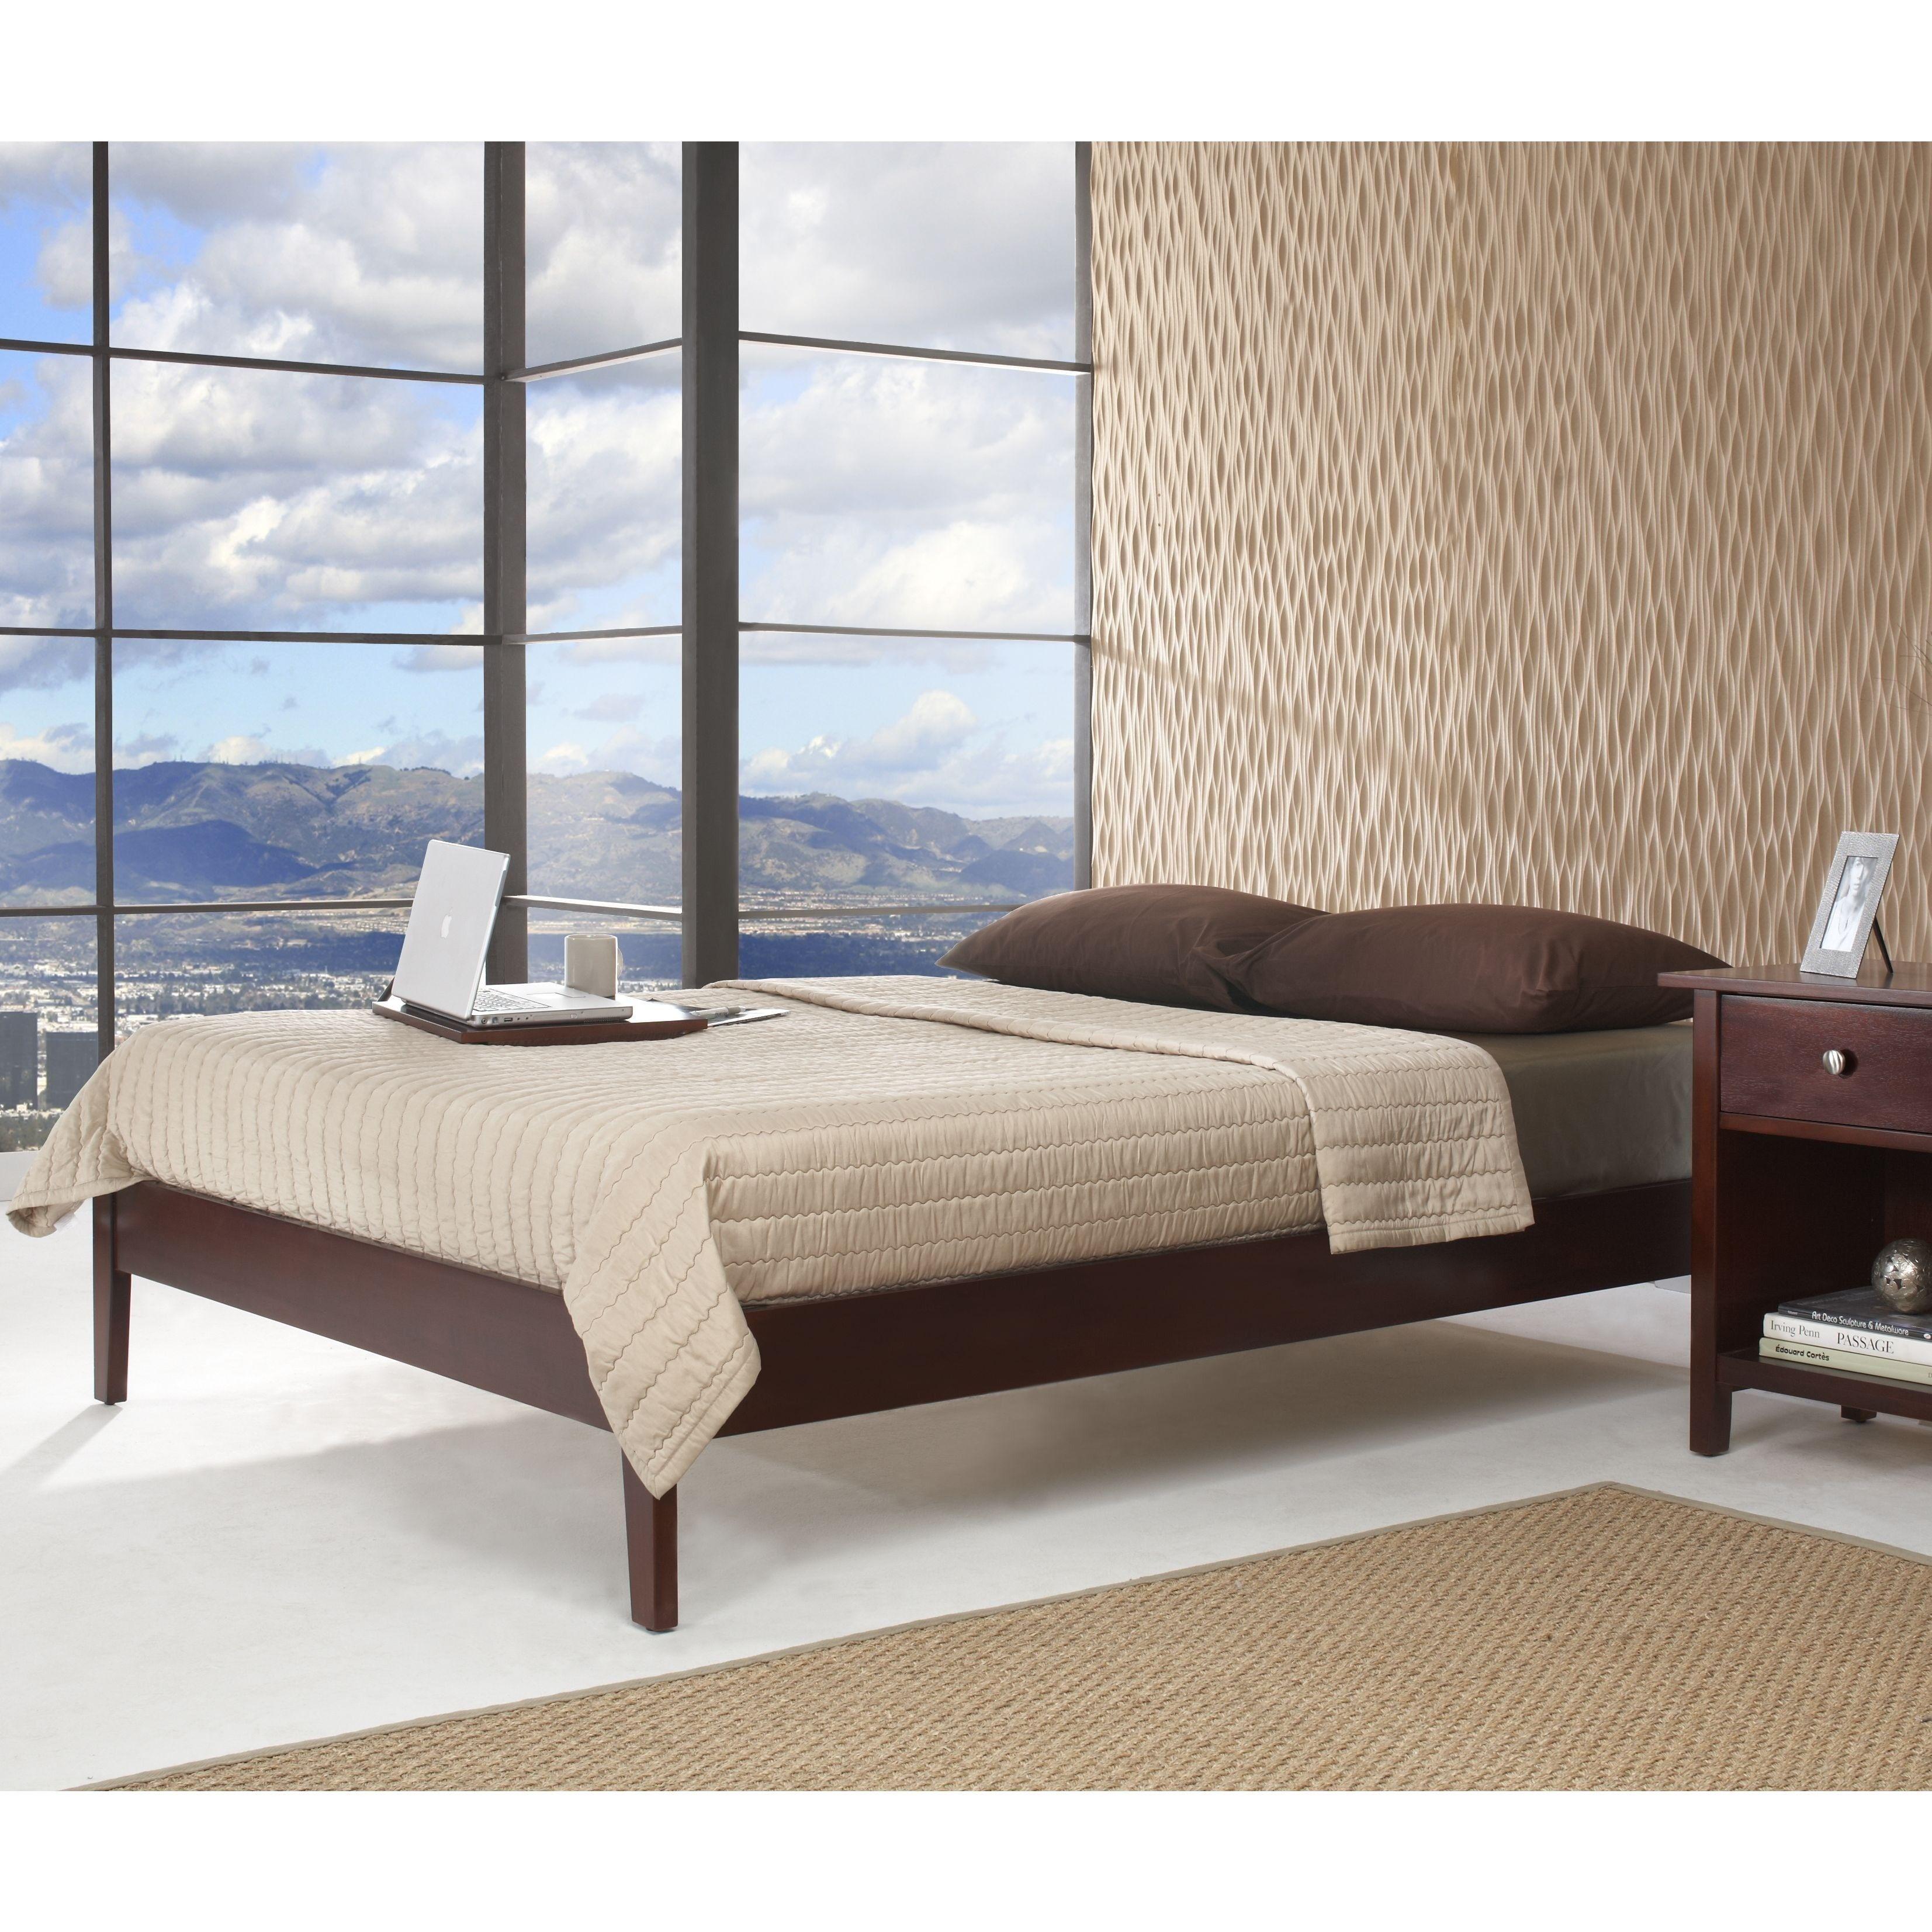 17 special platform bed frame no headboard